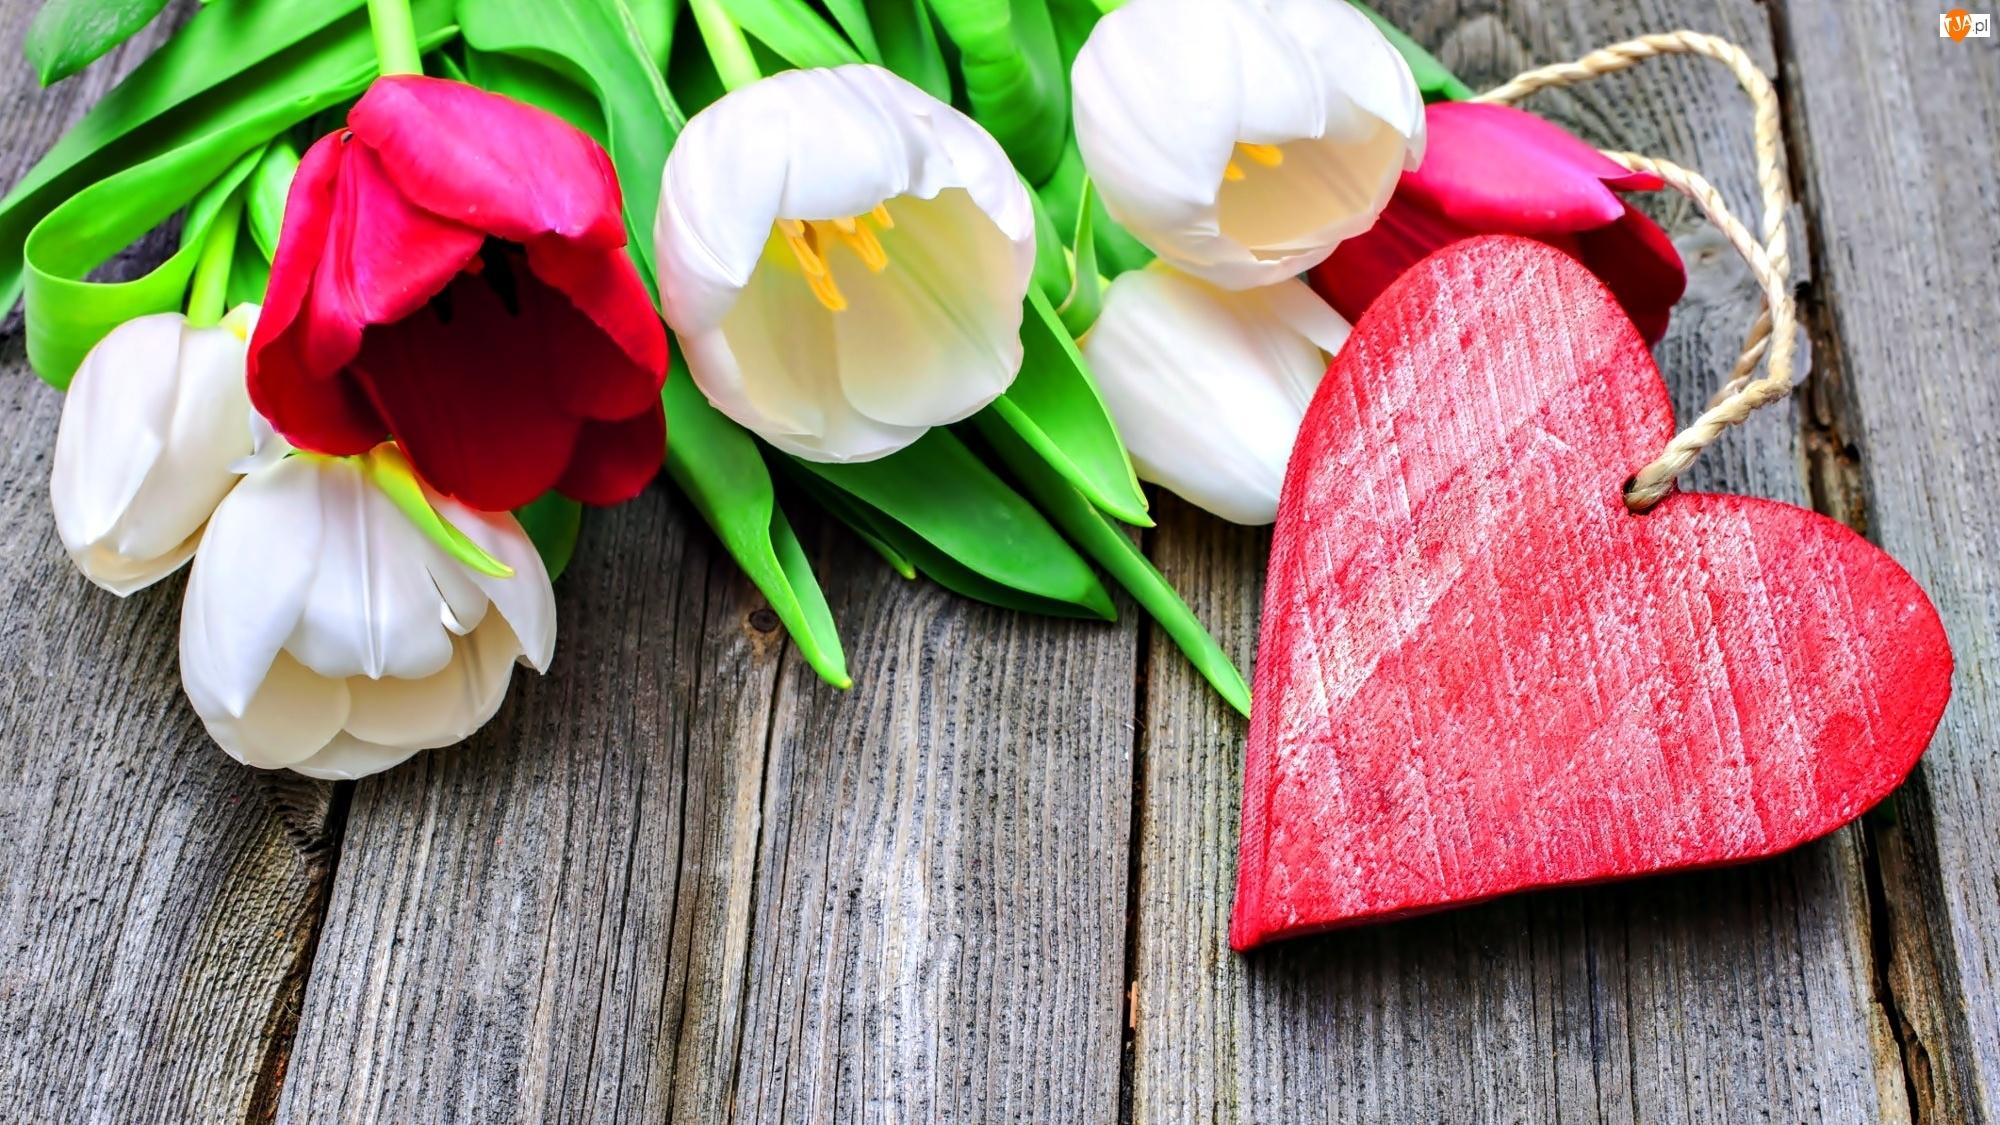 Serce, Walentynki, Tulipany